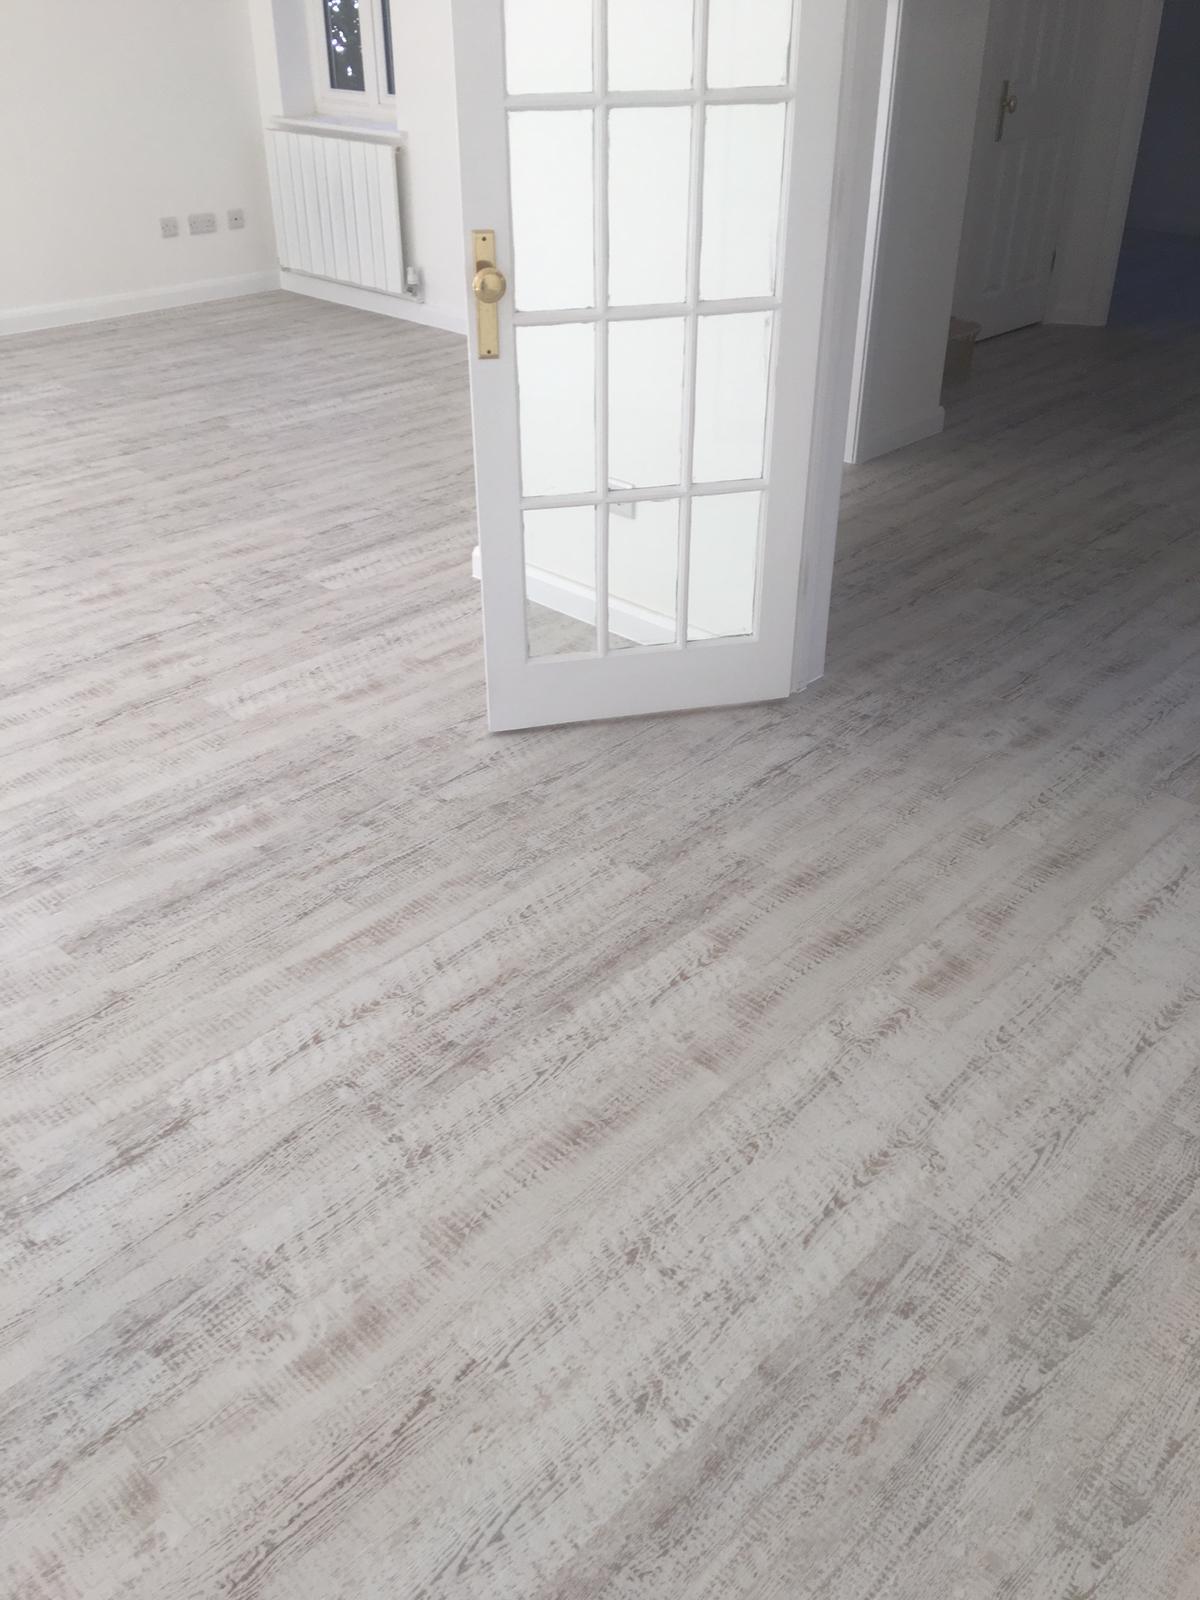 Uncategorised Haddenham Carpets